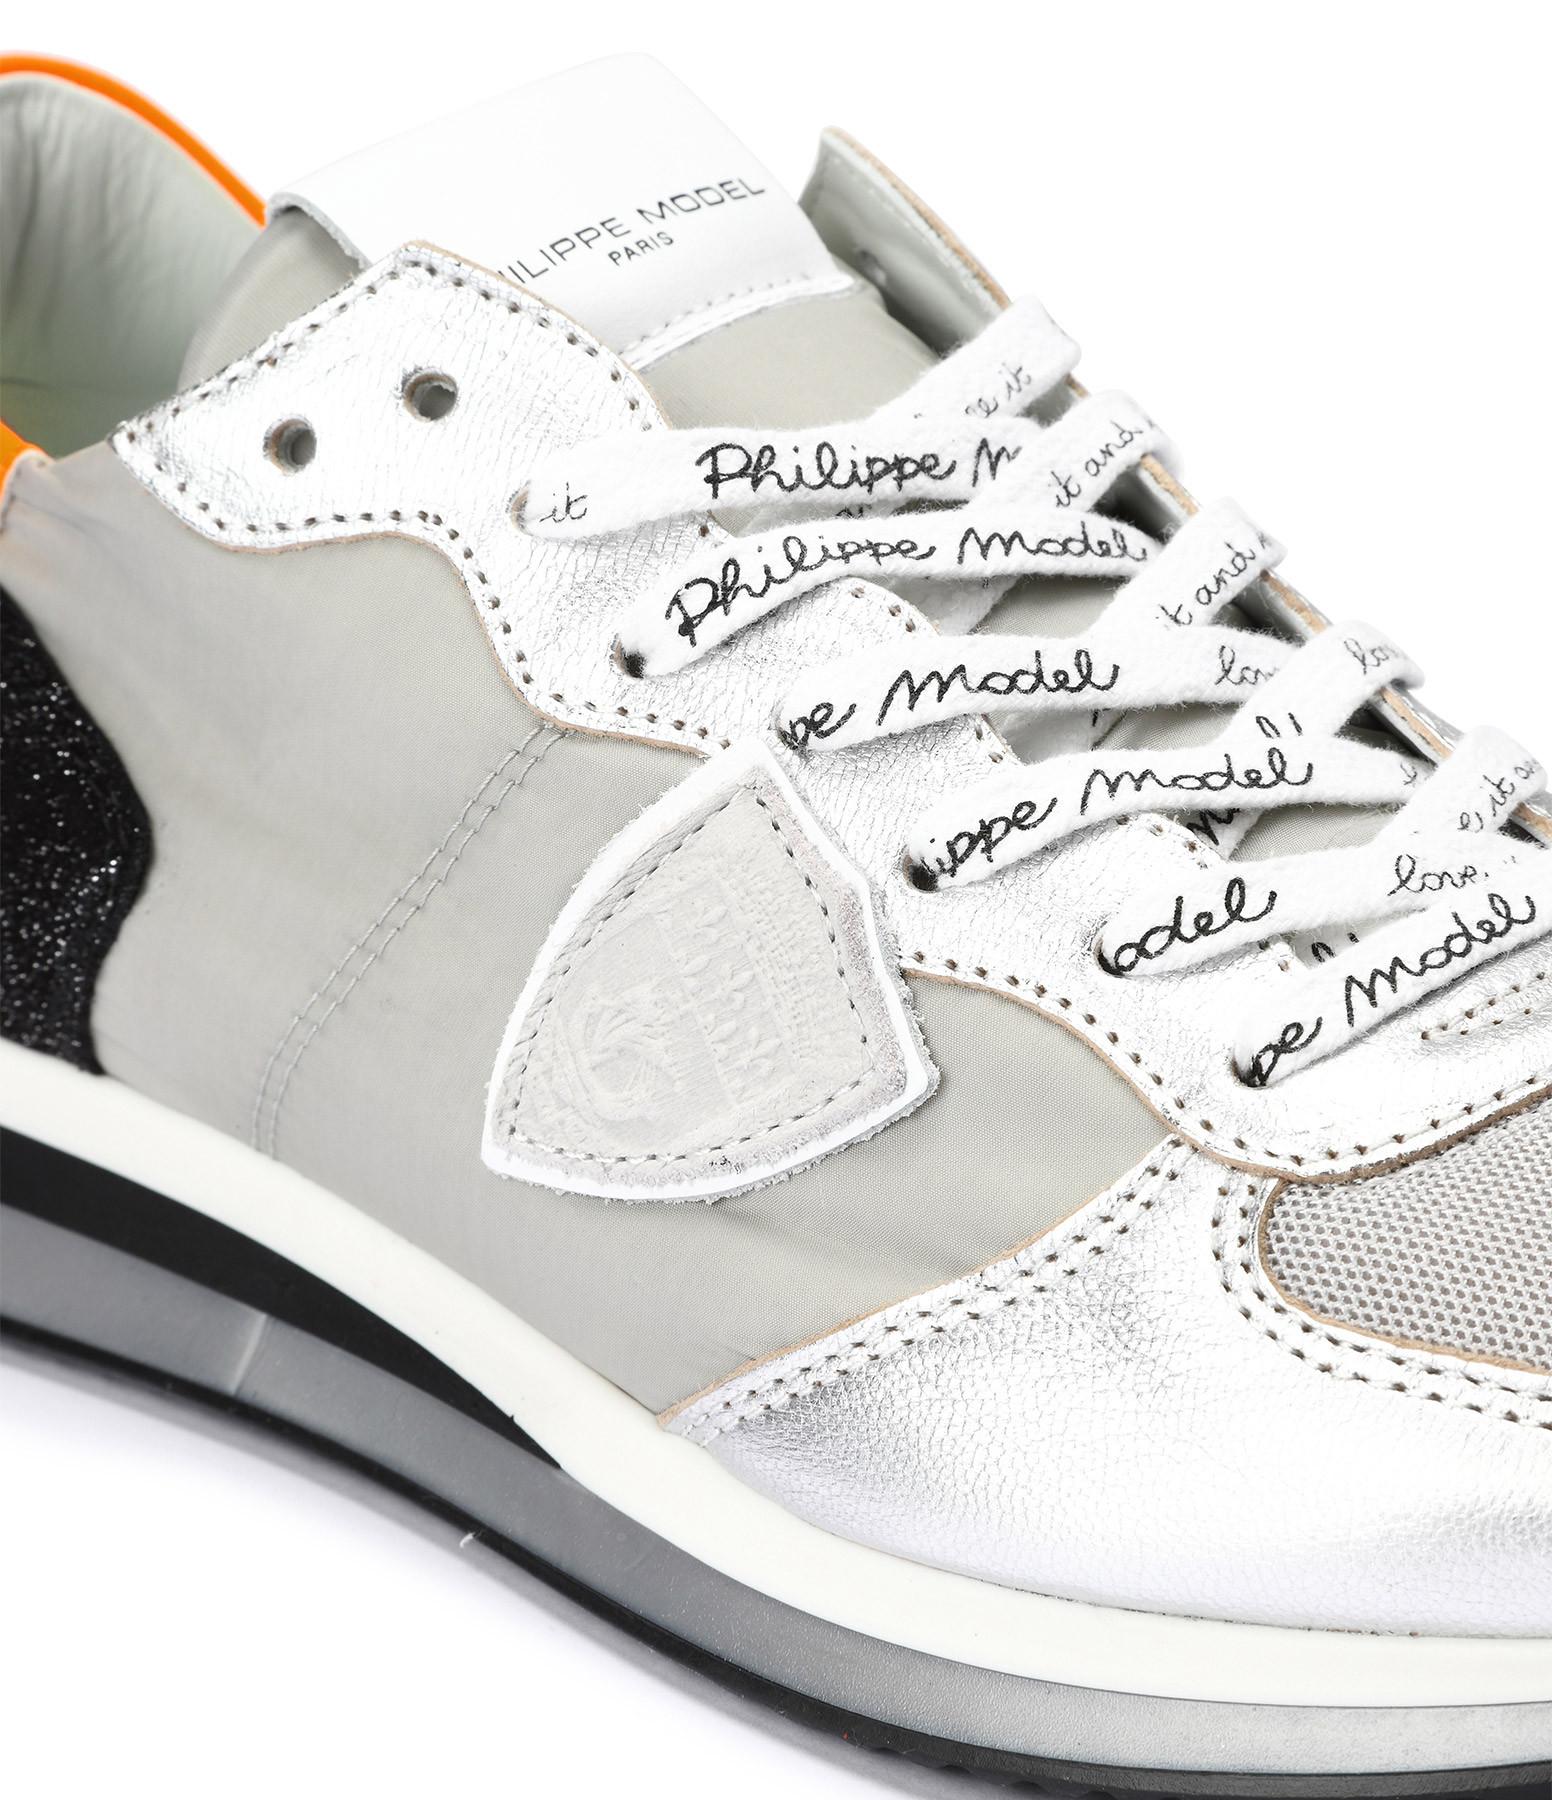 PHILIPPE MODEL - Baskets Trpx Galactique Gris Orange